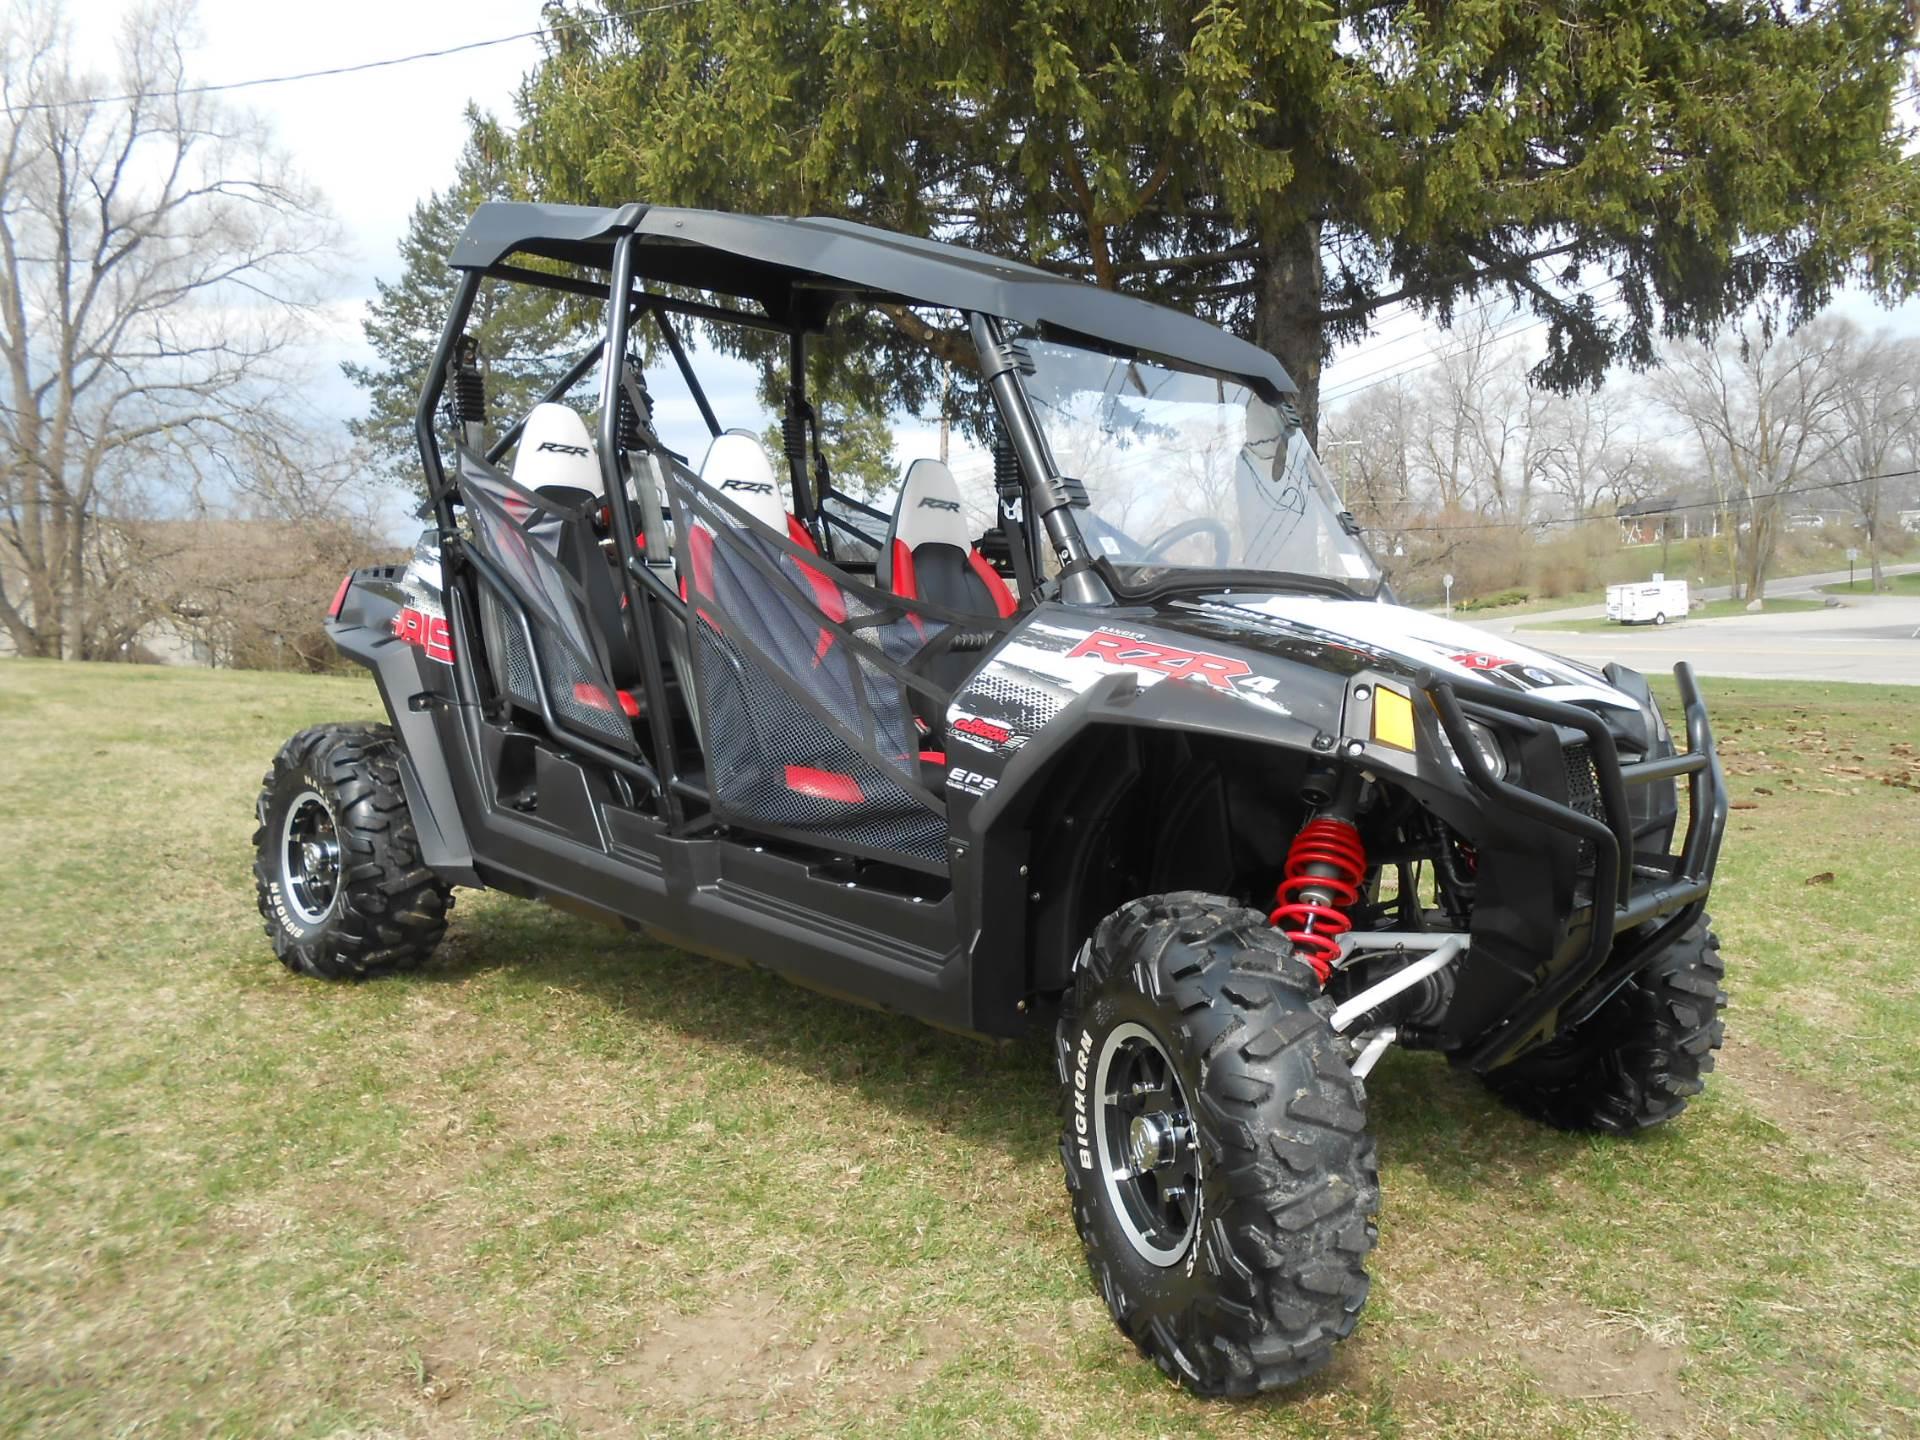 2012 Ranger RZR 4 800 EPS Robby Gordon Edition